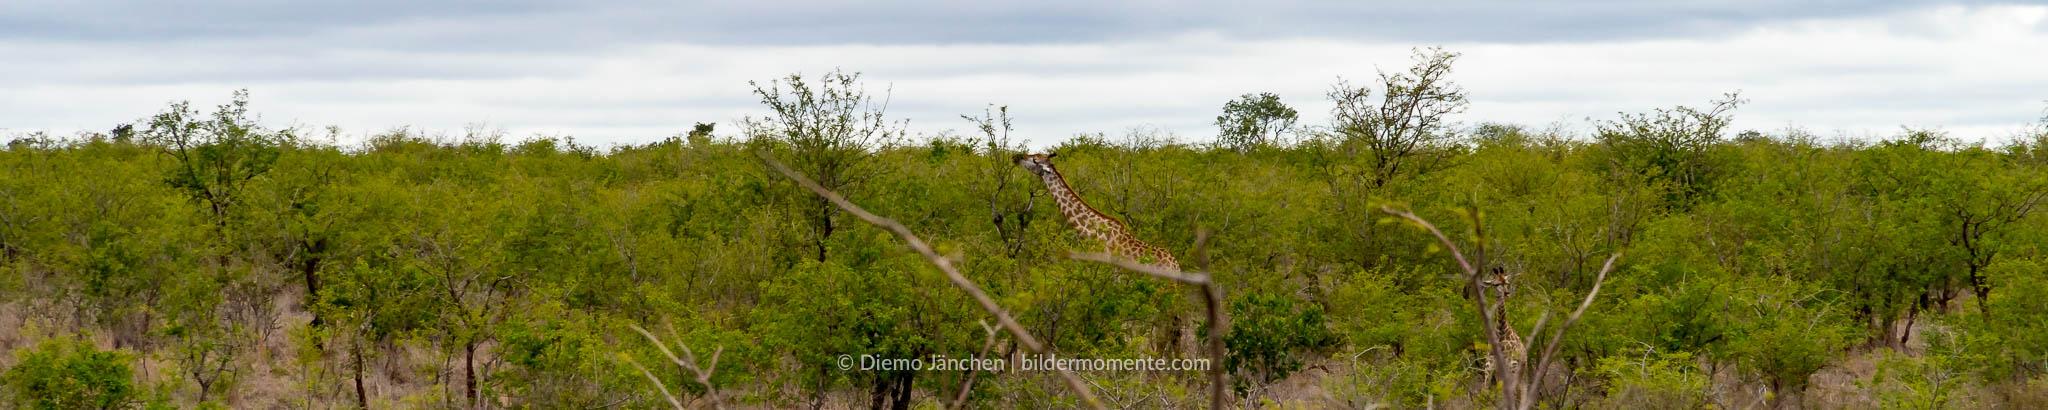 Giraffe im Kruger National Park